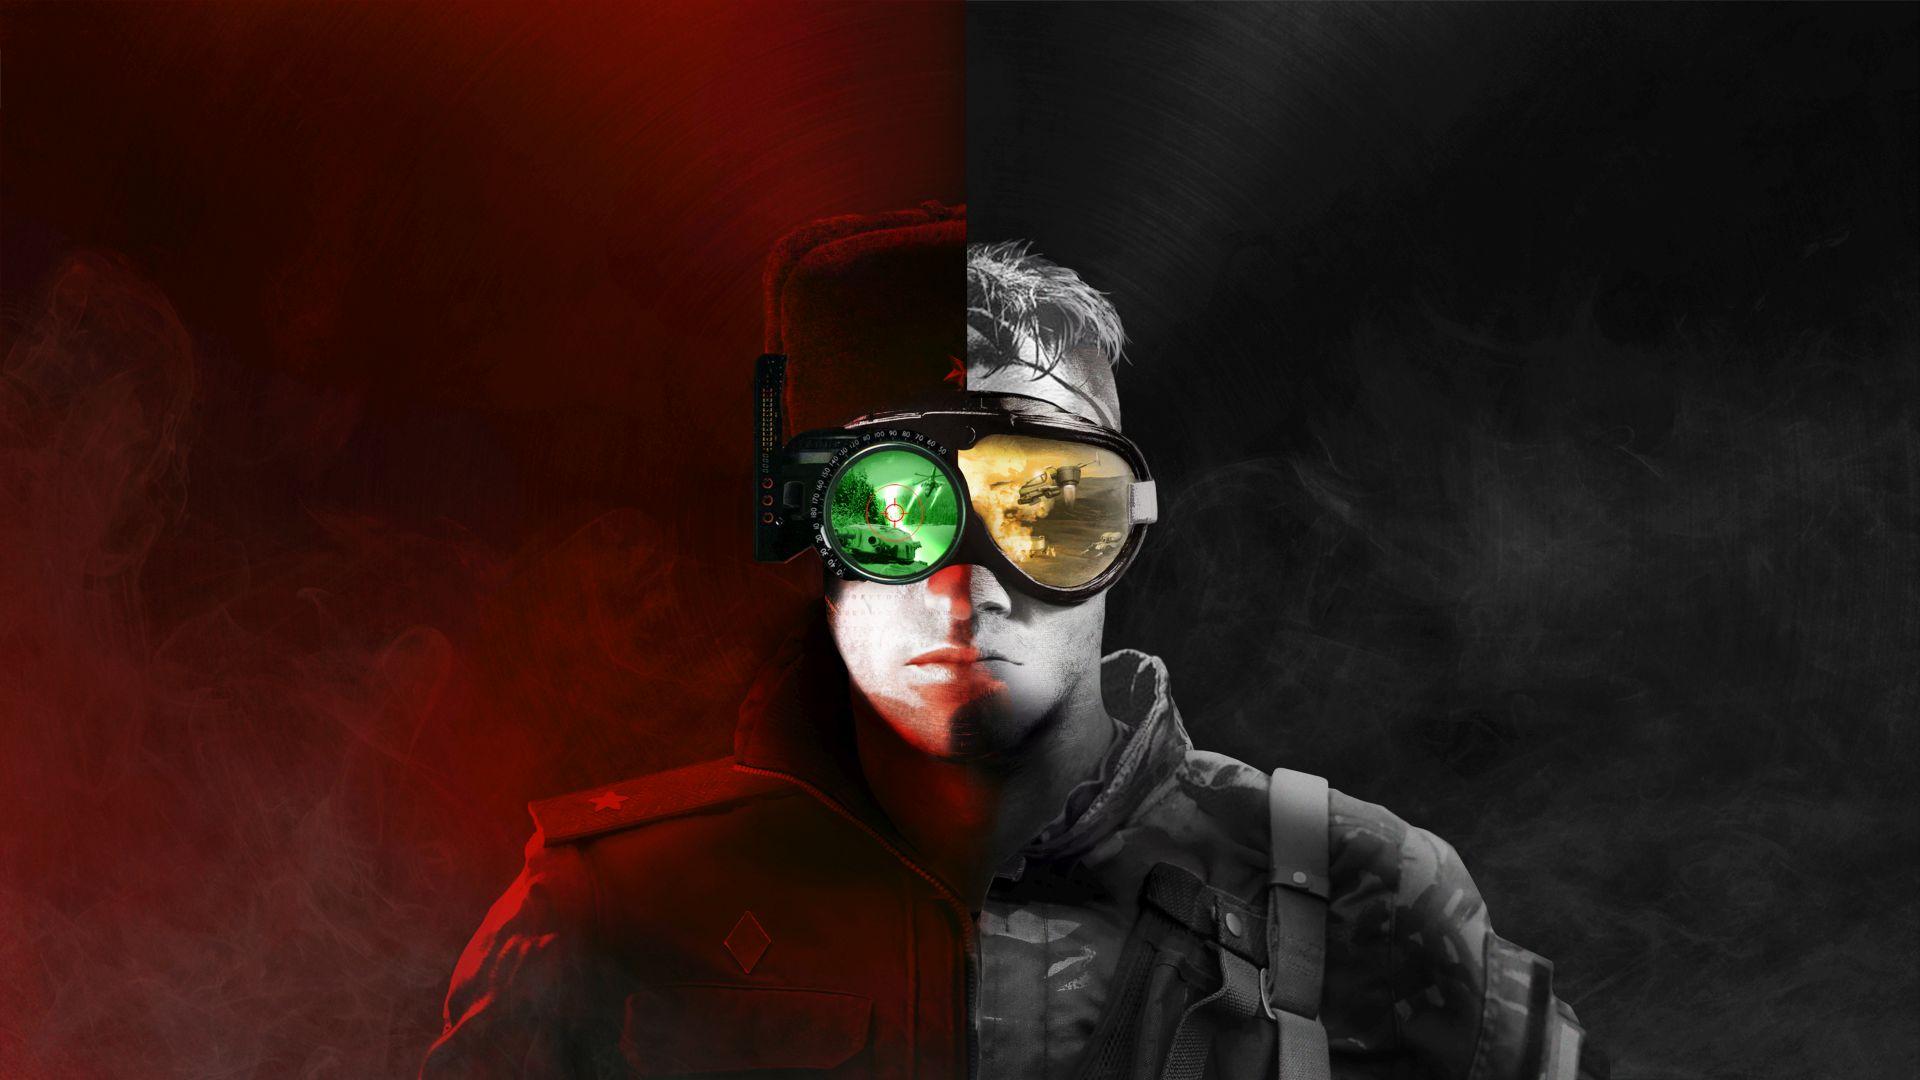 تاریخ عرضه Command and Conquer Remastered